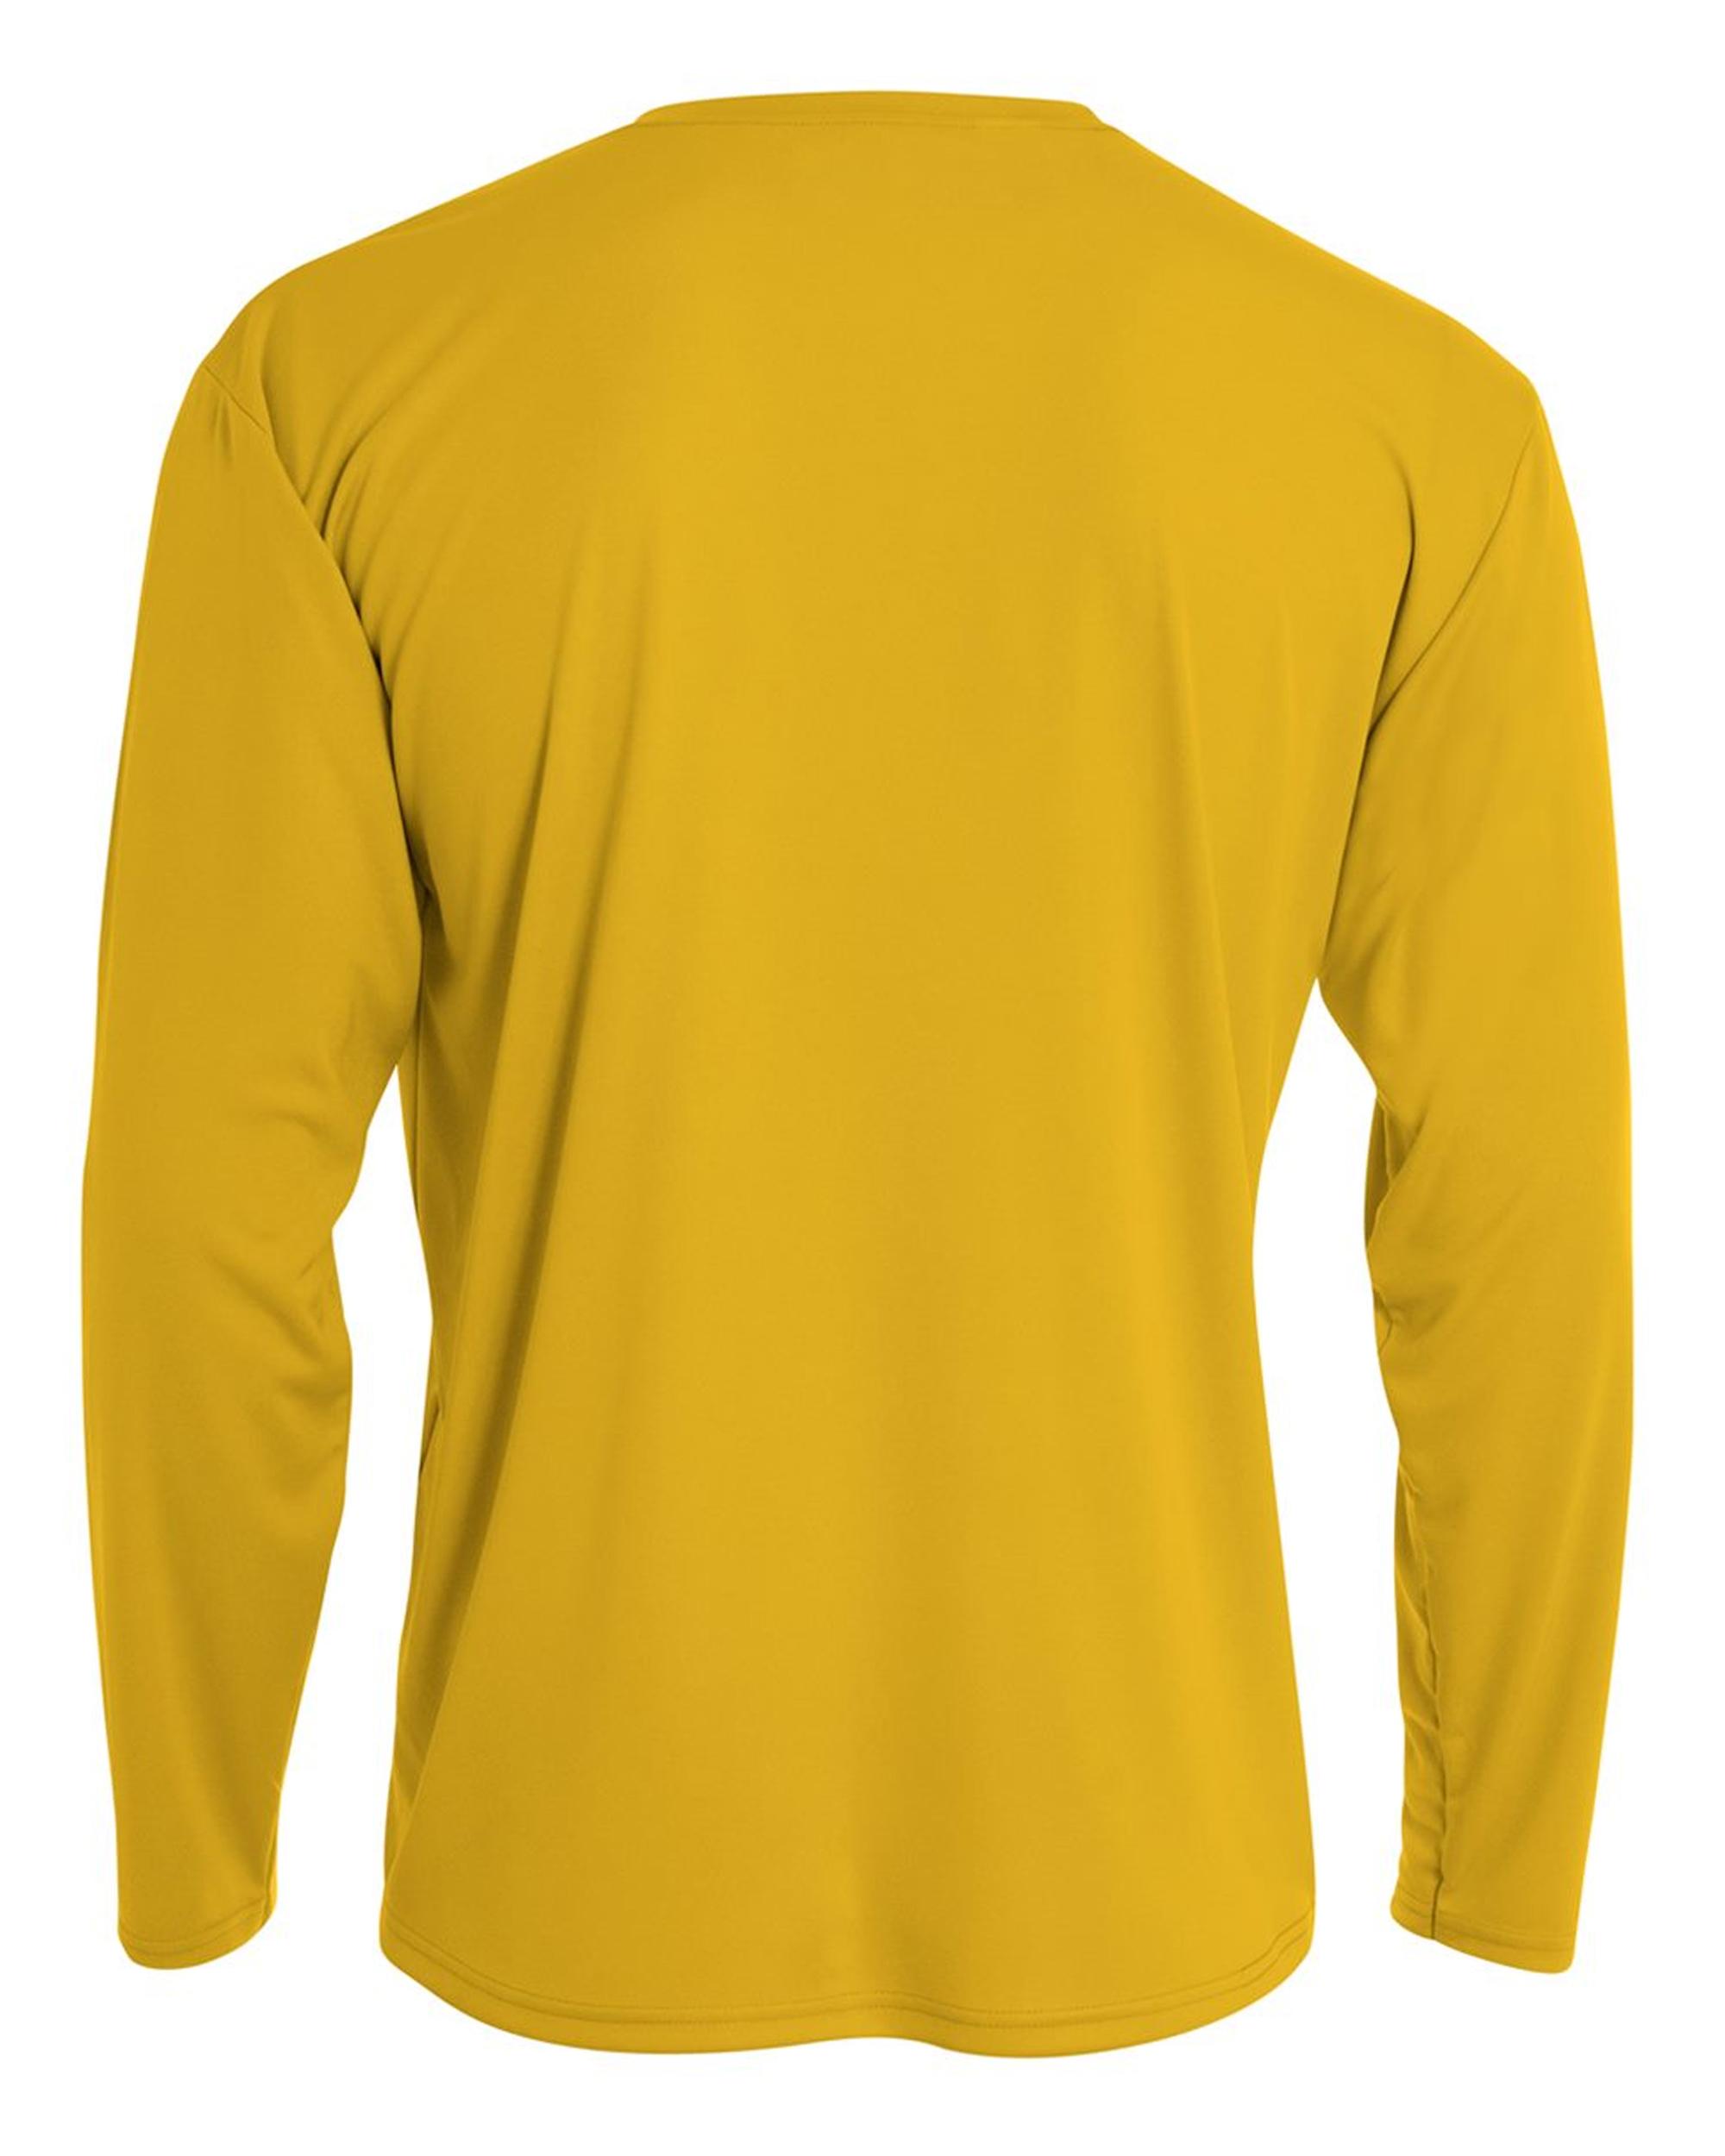 Men-039-s-Long-Sleeve-Loose-Fit-Rash-Guard-Surf-Shirt-Water-Sports-Swimwear thumbnail 10